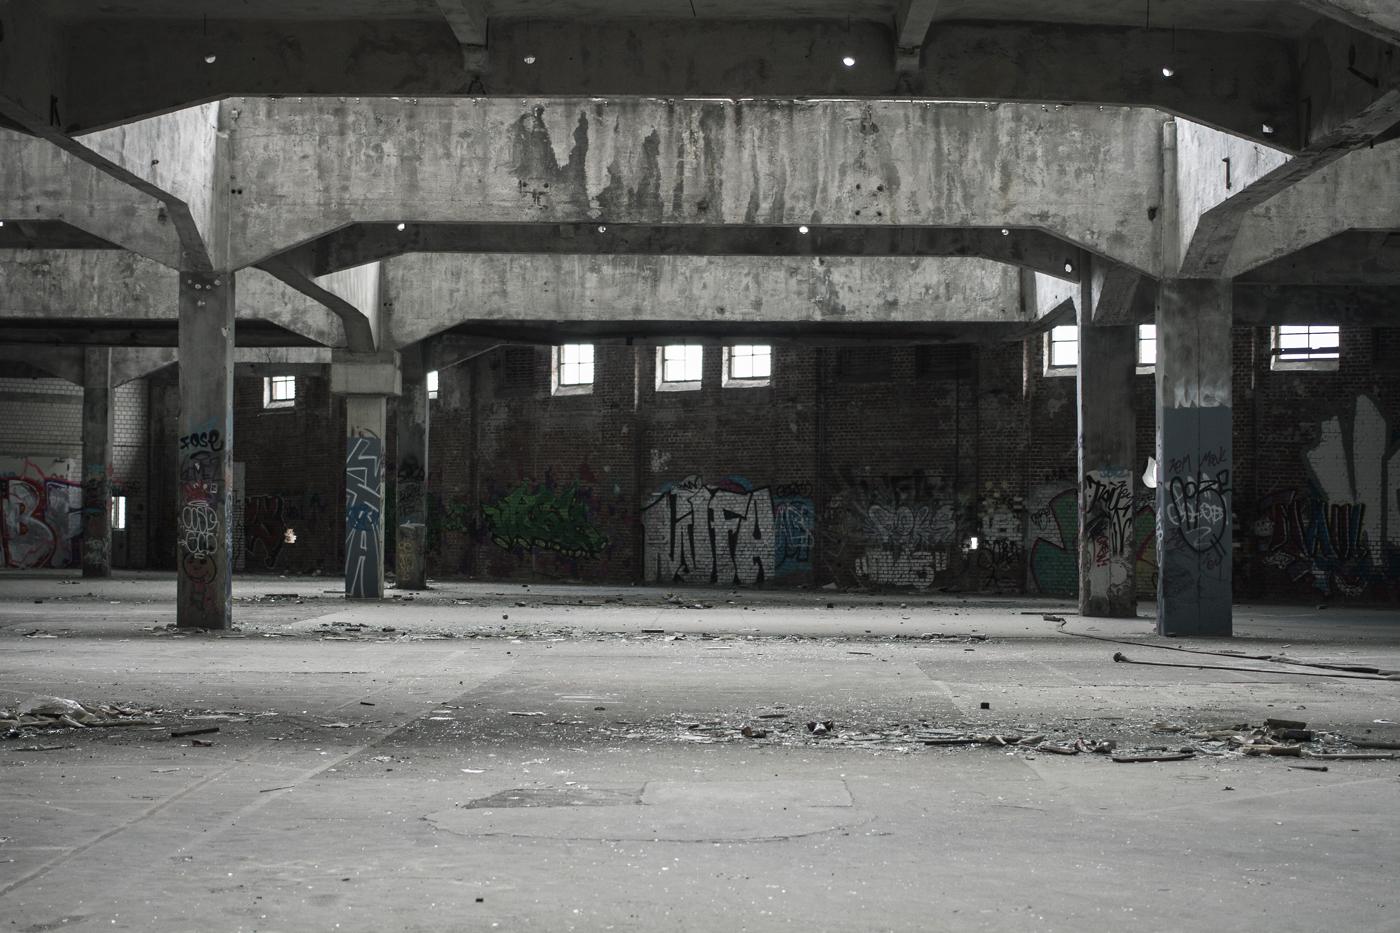 verlassene papierfabrik düsseldorf